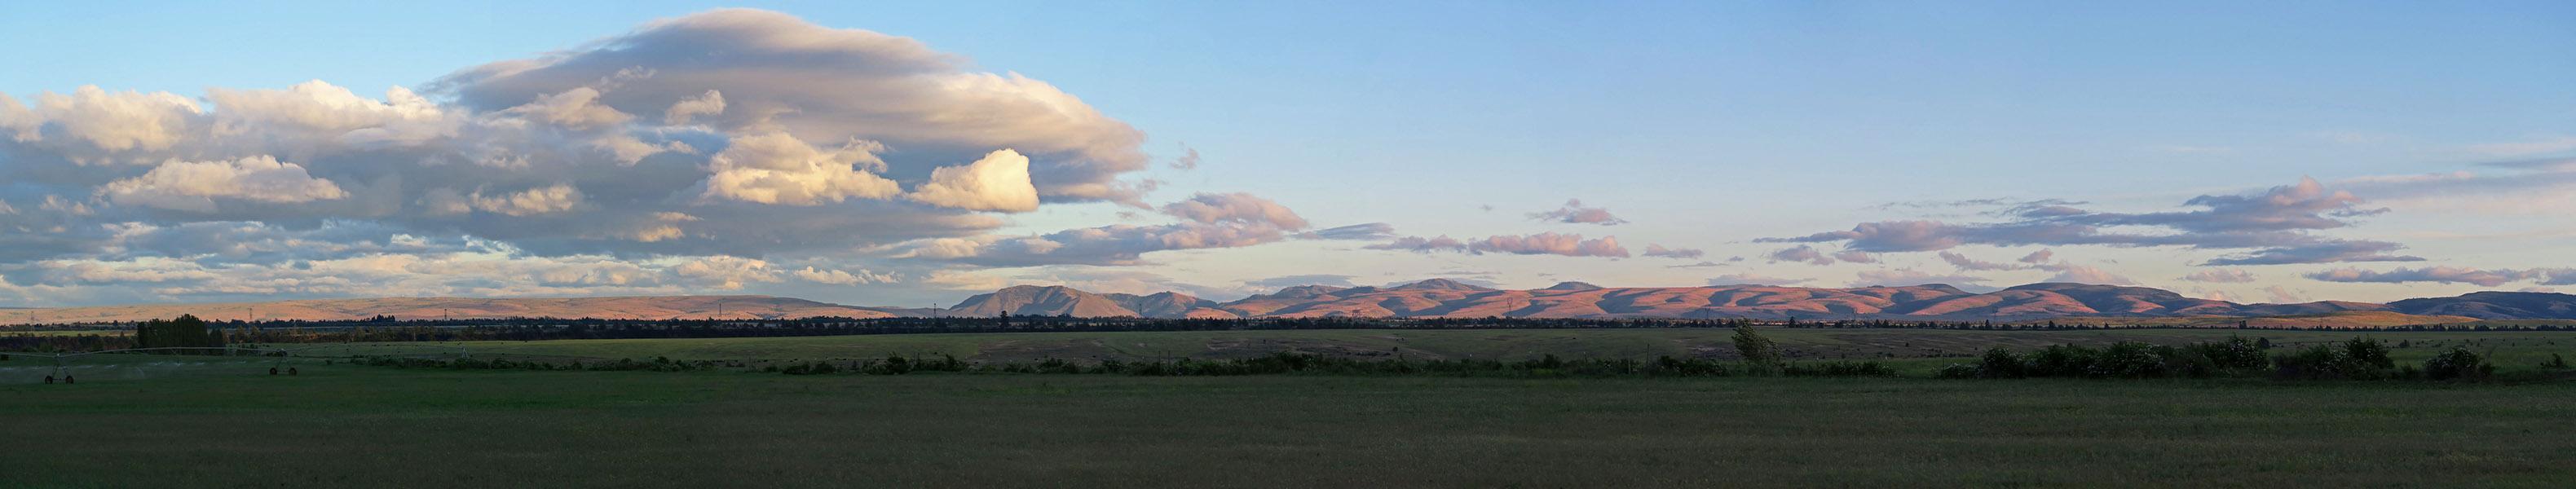 sunset clouds panorama [Wamic Market Road, Wasco County, Oregon]